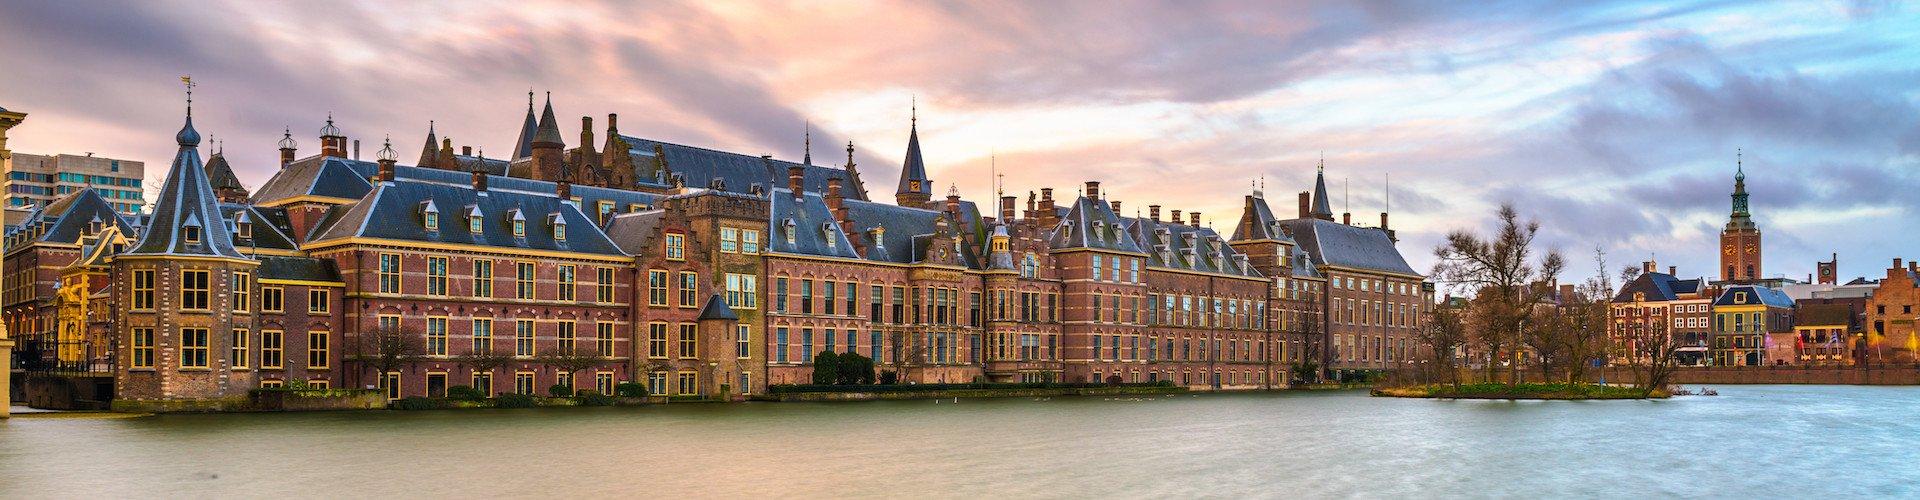 Familienurlaub in Zuid-Holland